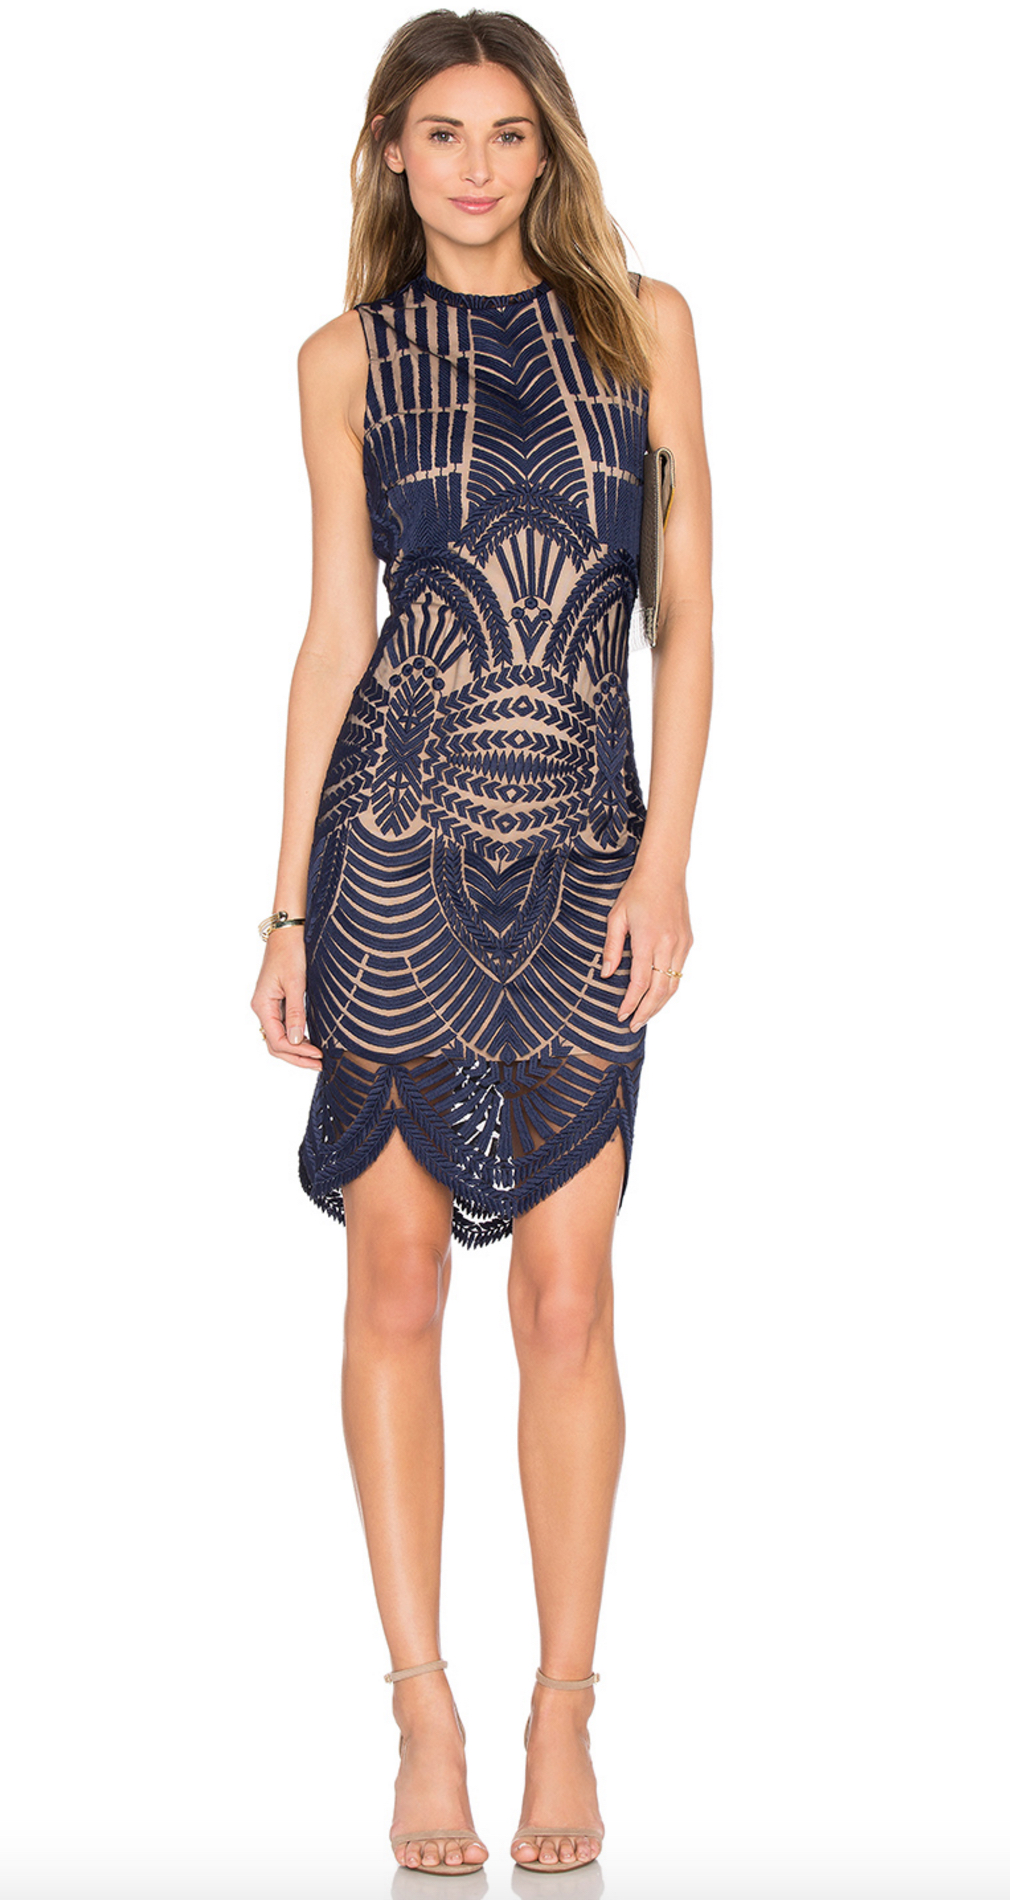 Bardot divinity dress $197